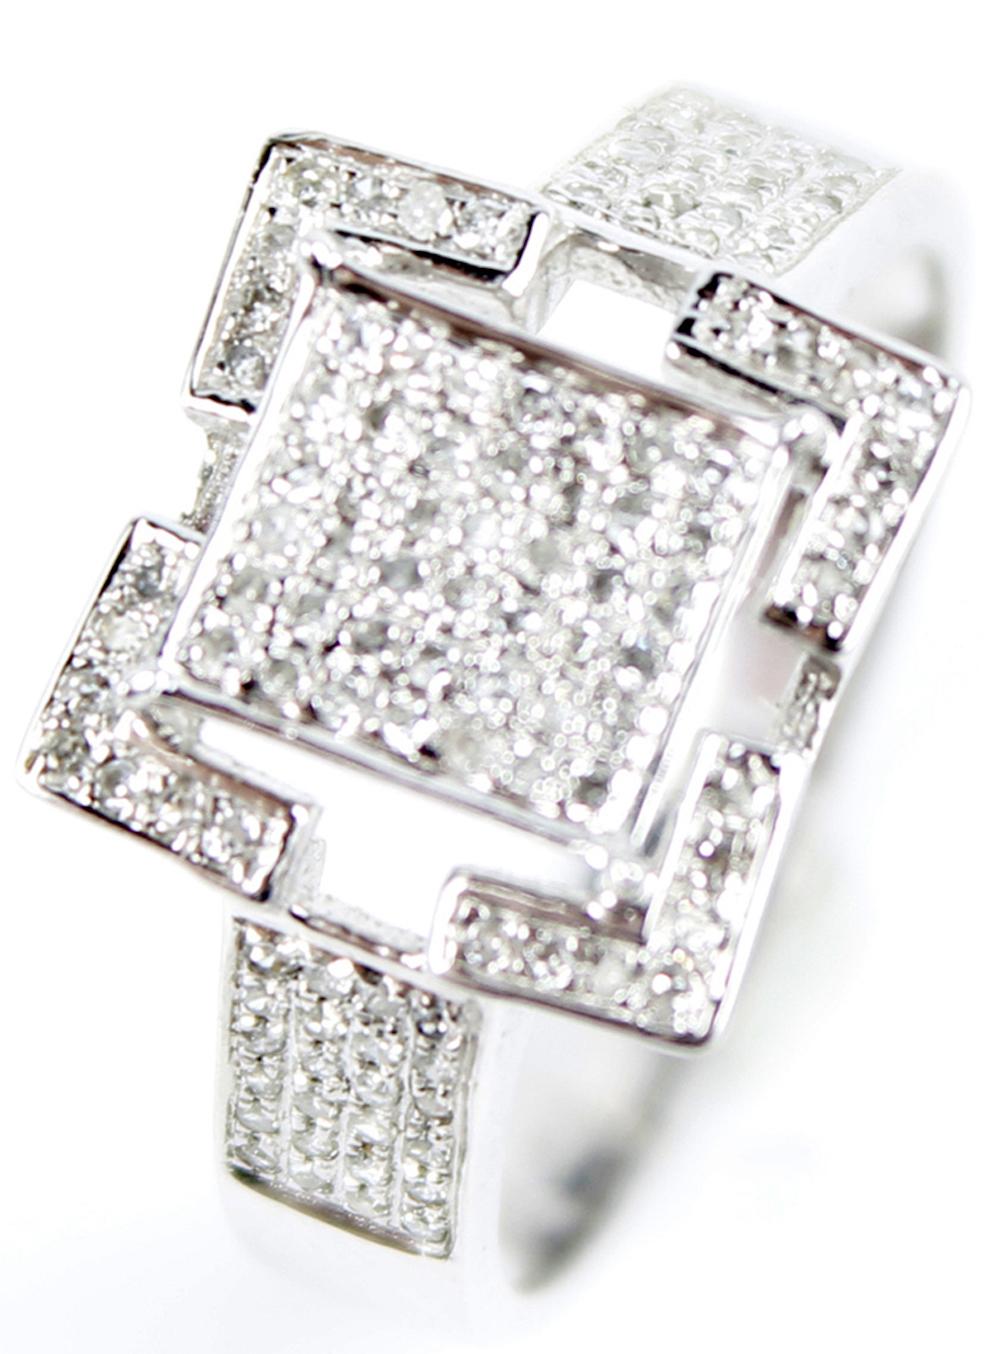 10k white gold ladies diamond ring. Black Bedroom Furniture Sets. Home Design Ideas